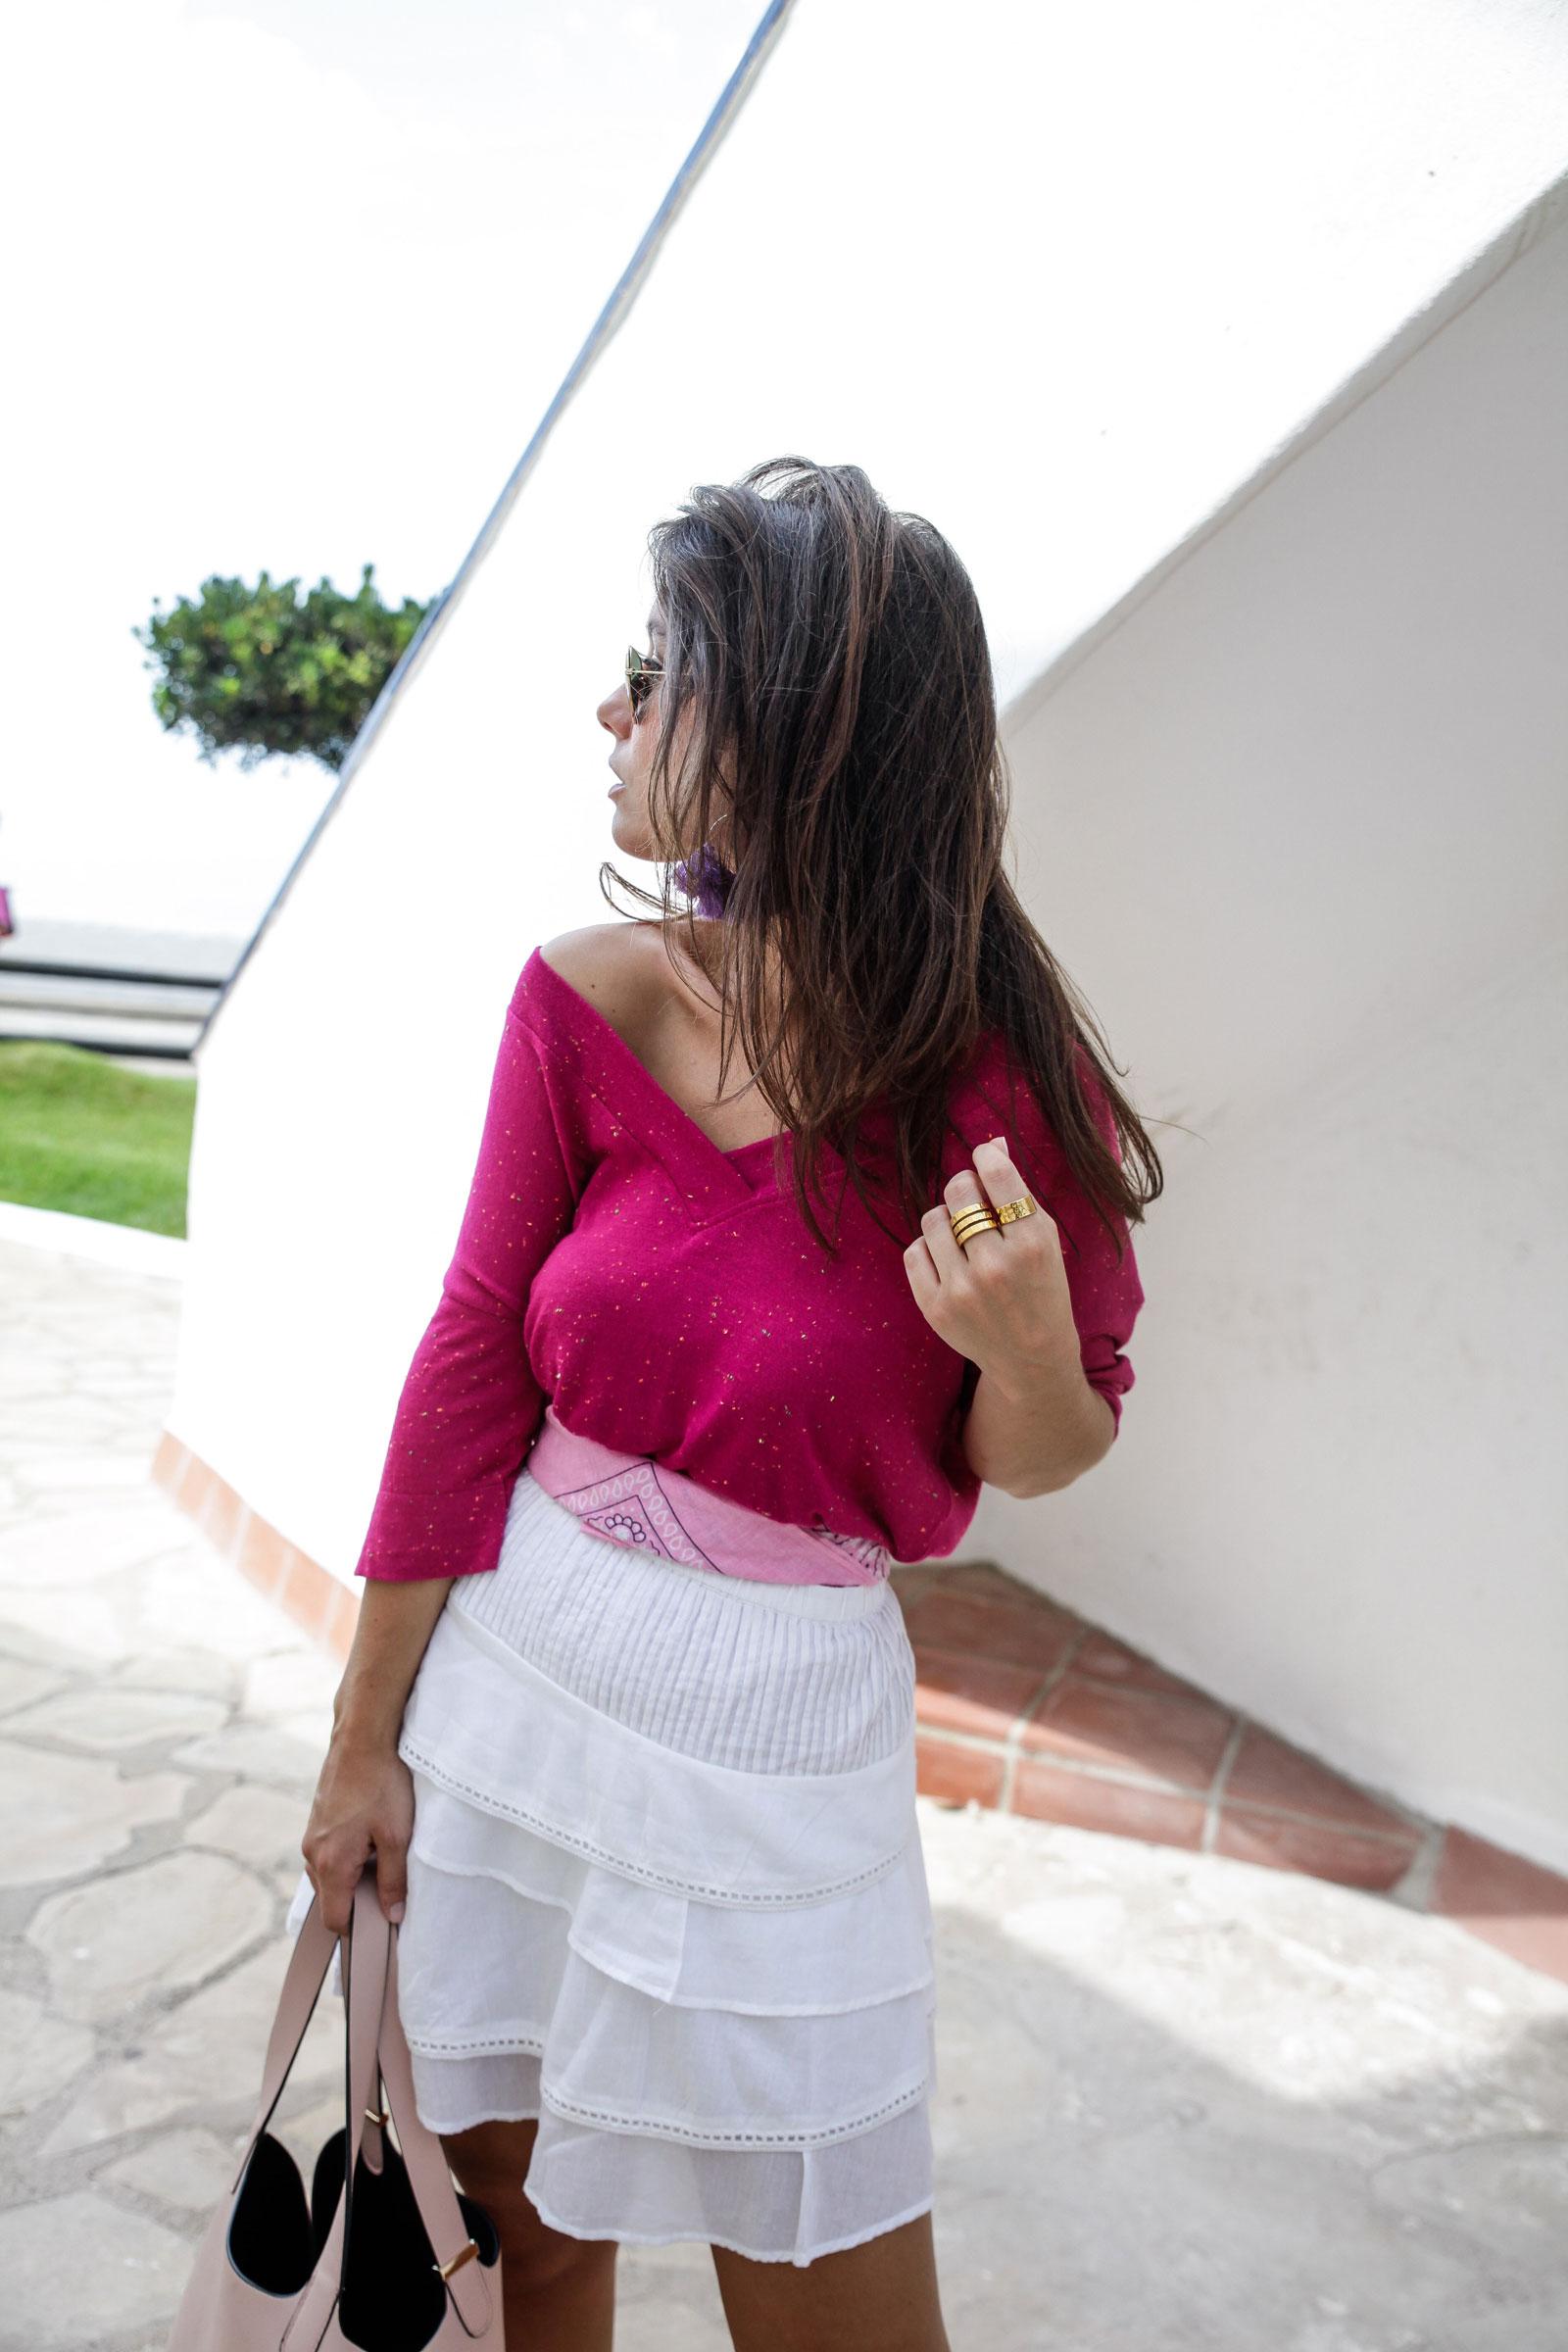 013_Camiseta_rosa_rüga_falda_blanca_look_verano_theguestgirl_laura_influencer_barcelona_españa_spain_ootd_inspo